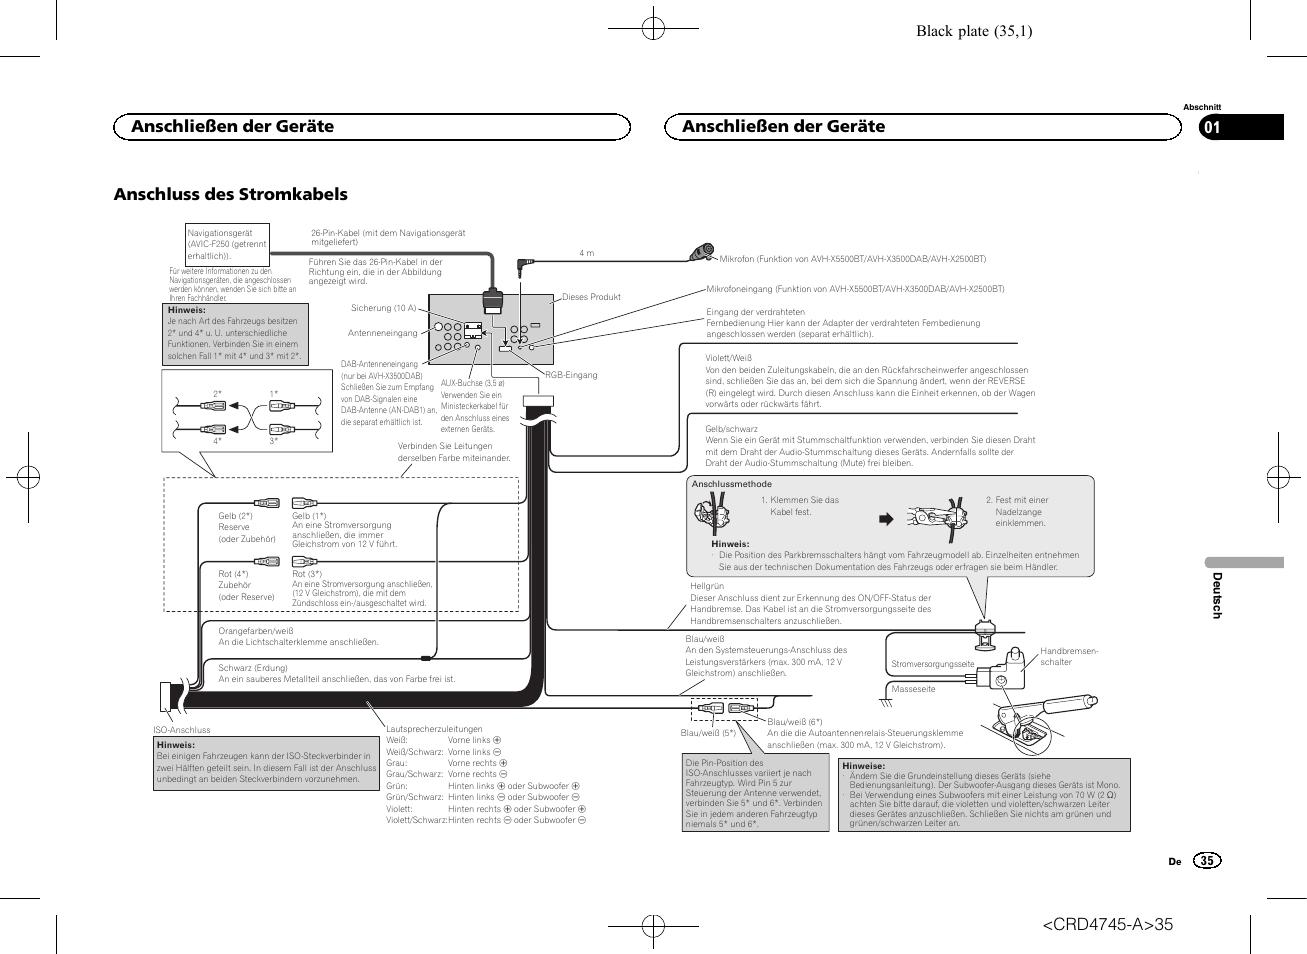 pioneer avh wiring harness diagram avh-p1400dvd car radio stereo audio autoradio connector p1400dvd  sc 1 st  Wiring Diagrams : pioneer fh x700bt wiring harness diagram - yogabreezes.com